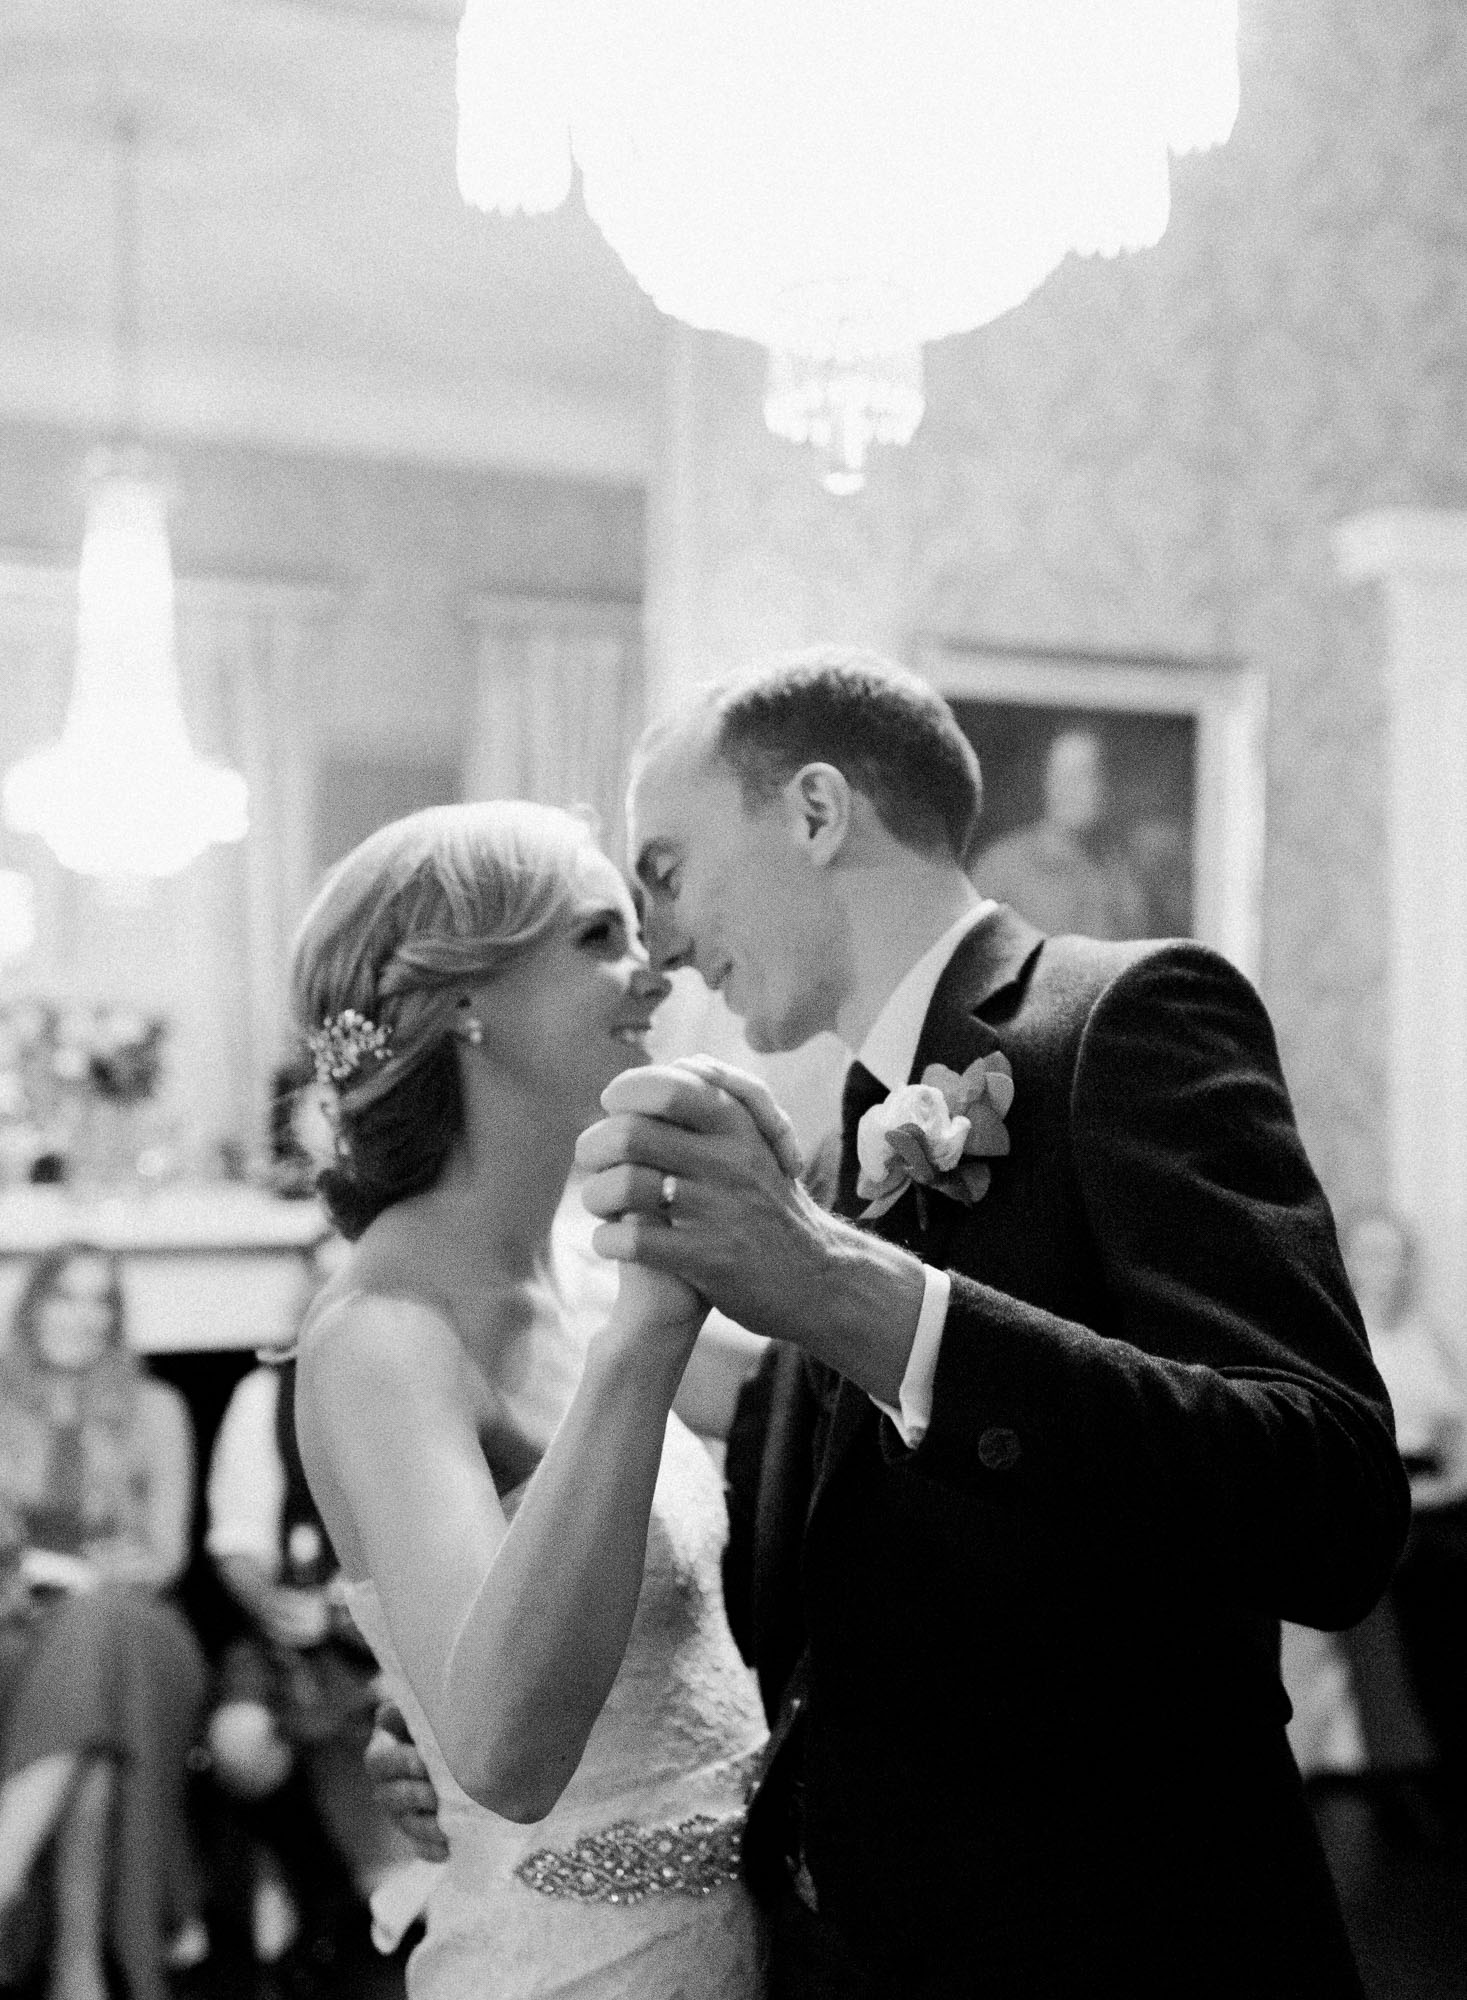 scottish_wedding_blairquhan_castle-105.jpg